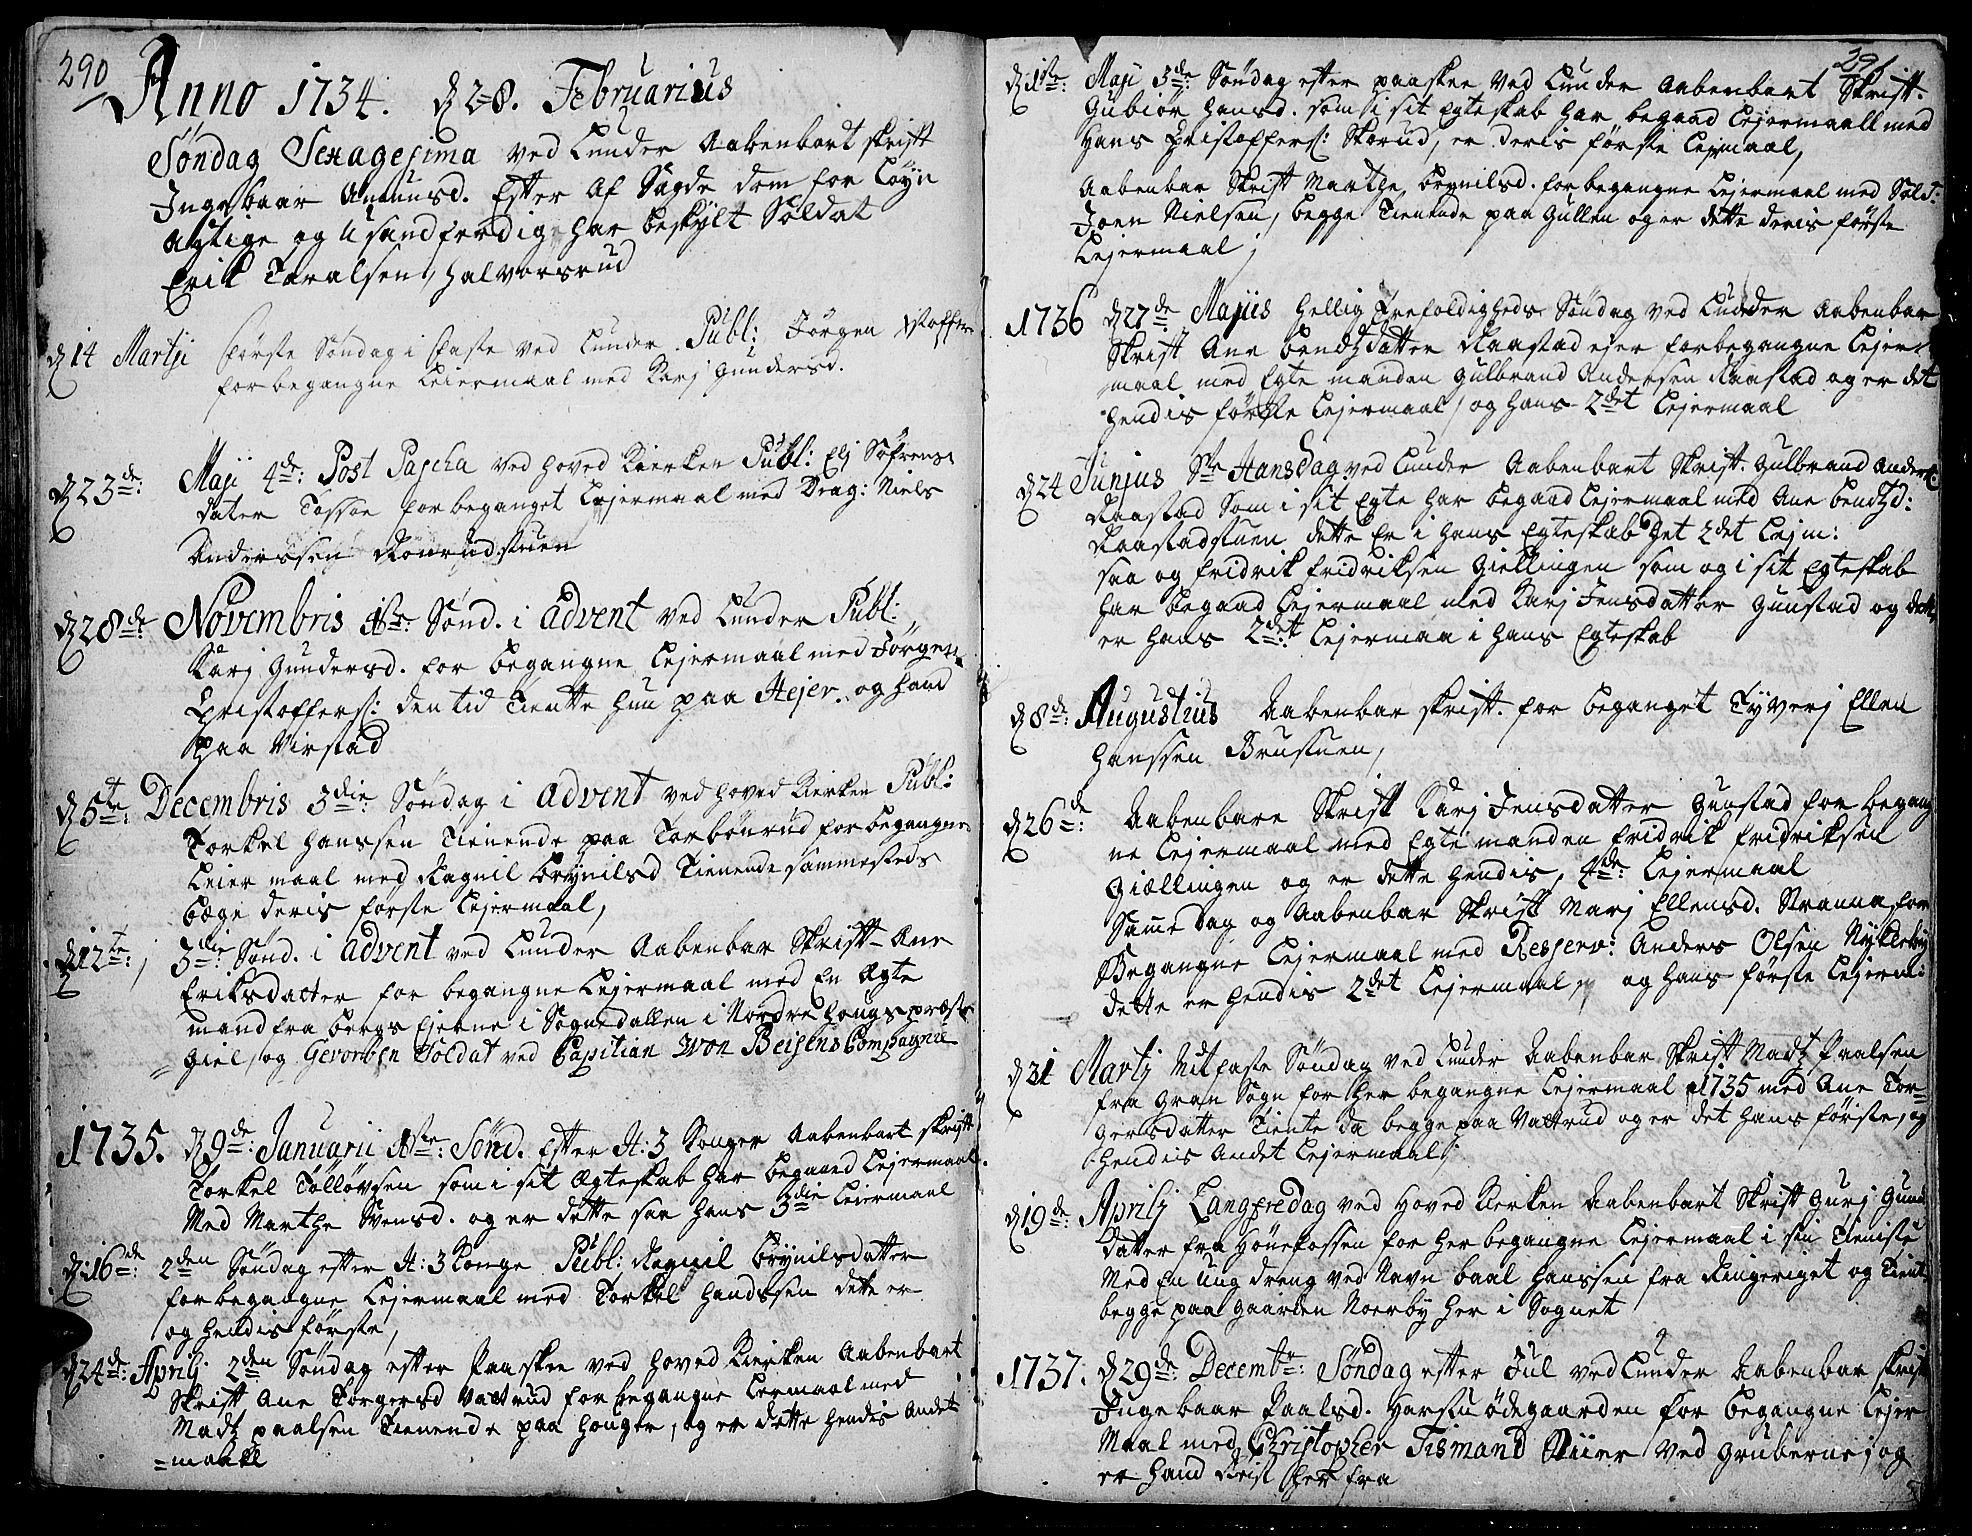 SAH, Jevnaker prestekontor, Ministerialbok nr. 2, 1725-1751, s. 290-291